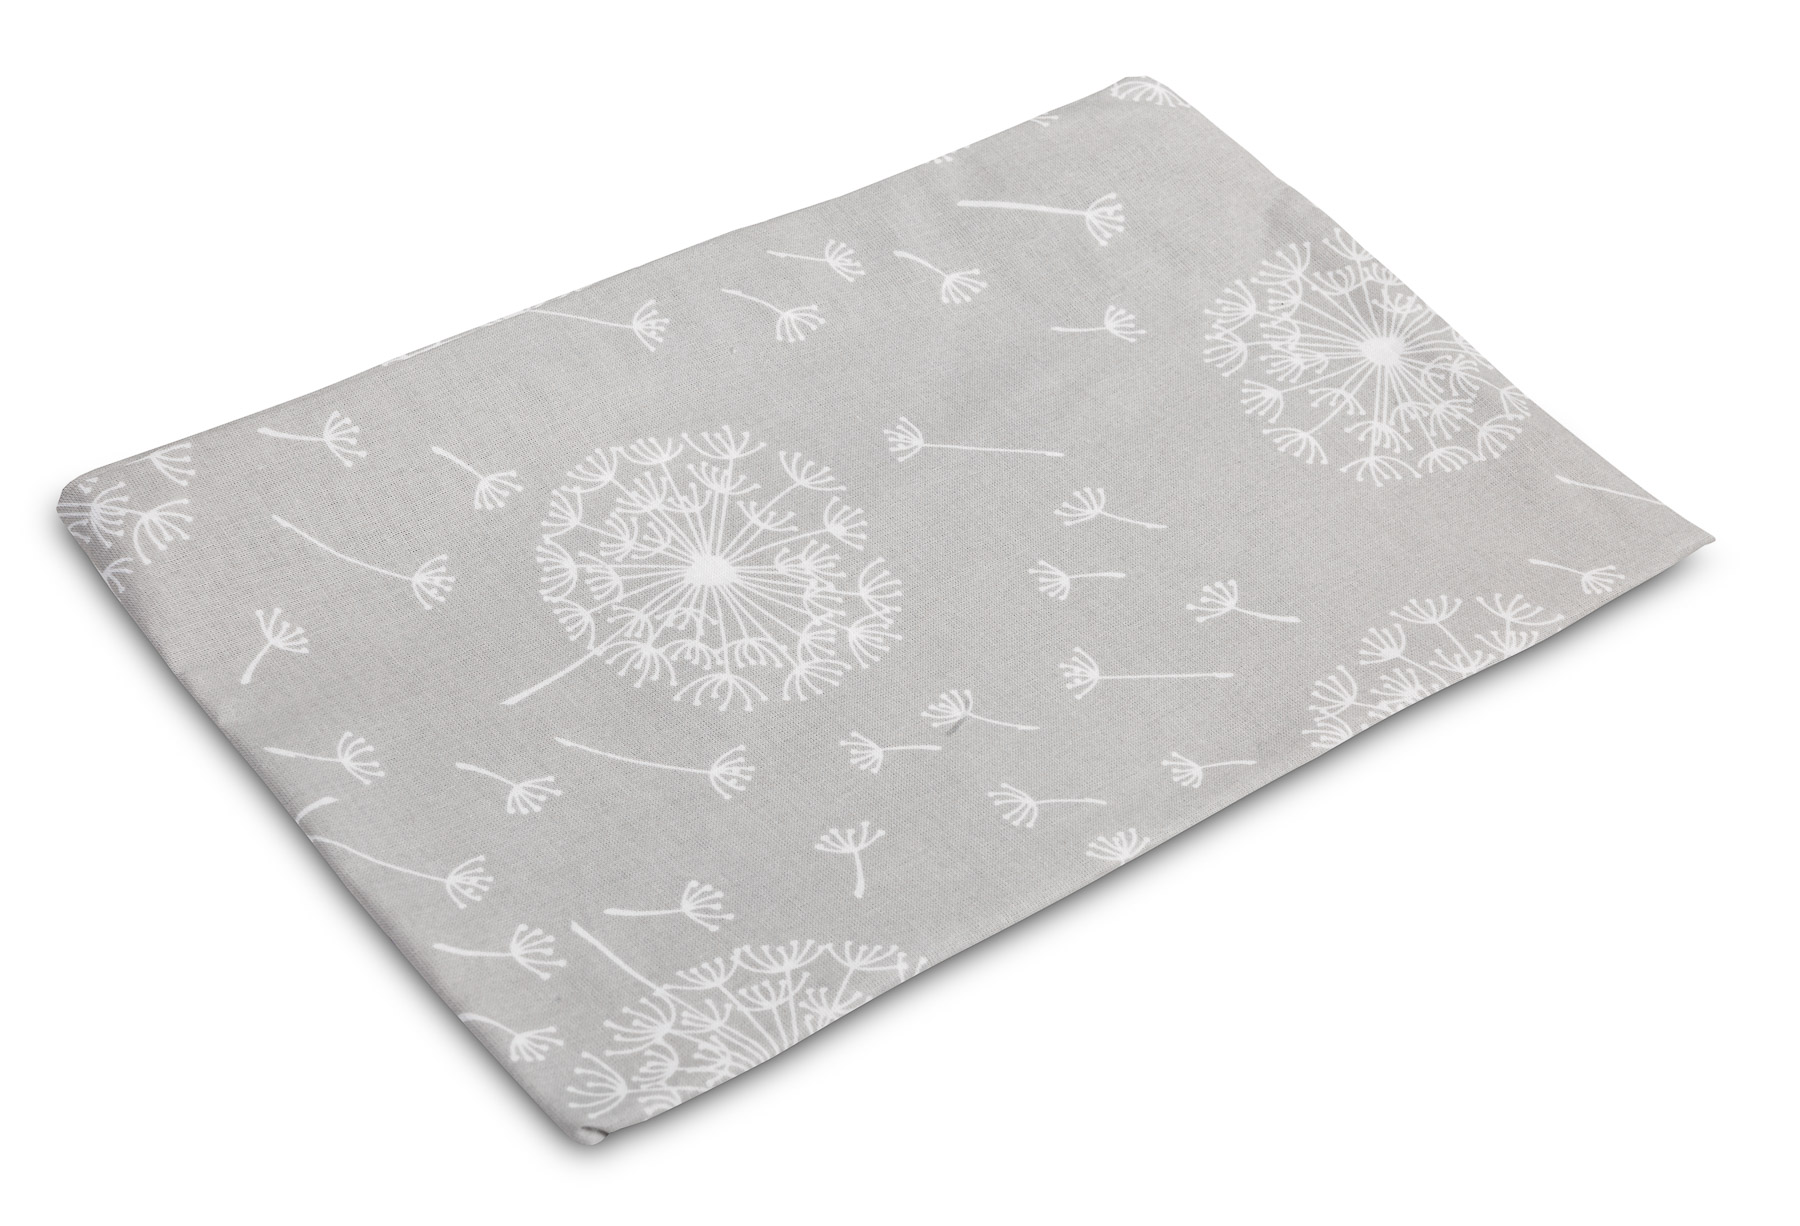 38×60 Wedge Pillowcase – Puff-balls